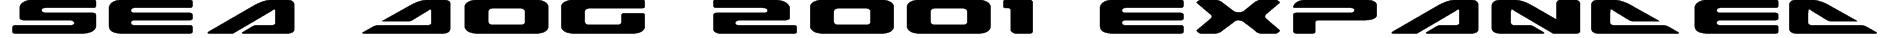 Sea Dog 2001 Expanded Font